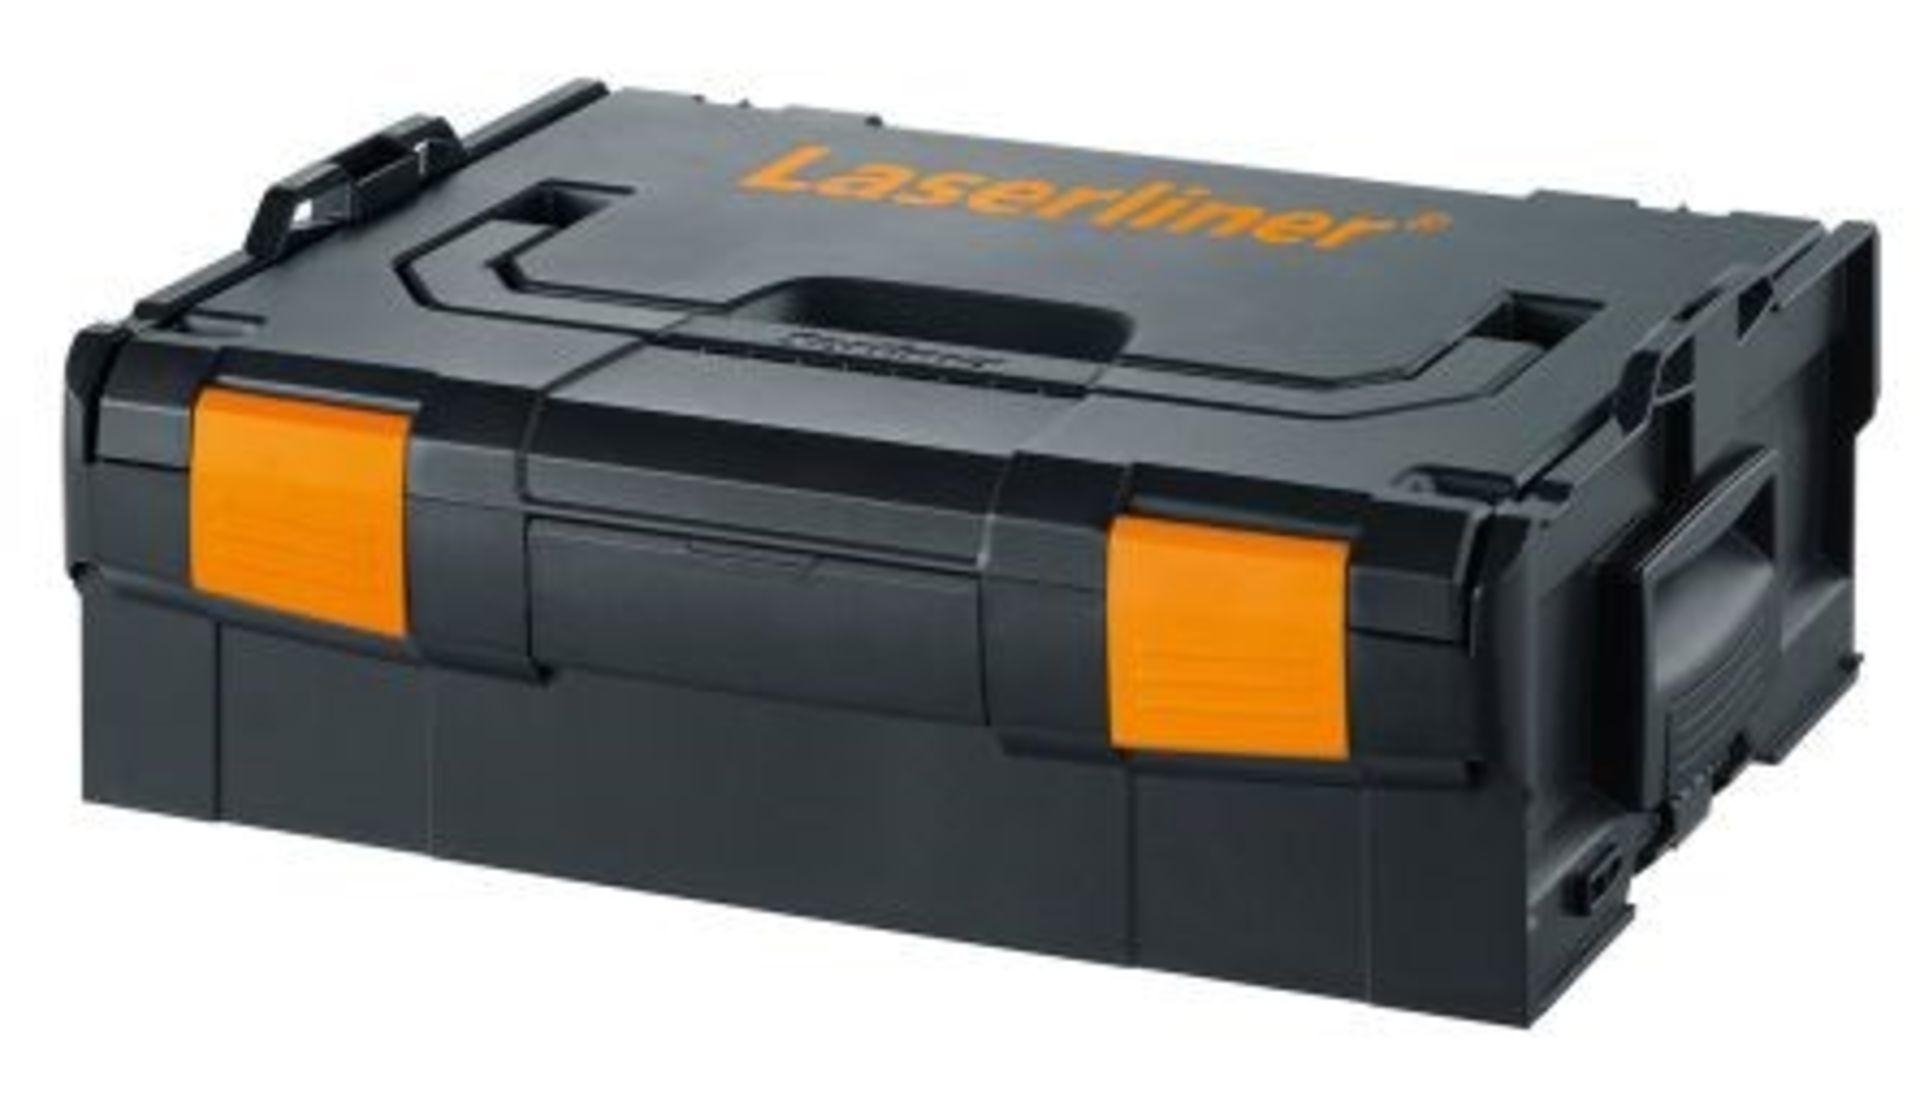 Laserliner 4mm probe Inspection Camera, BoreScope-Camera Set - Image 2 of 3